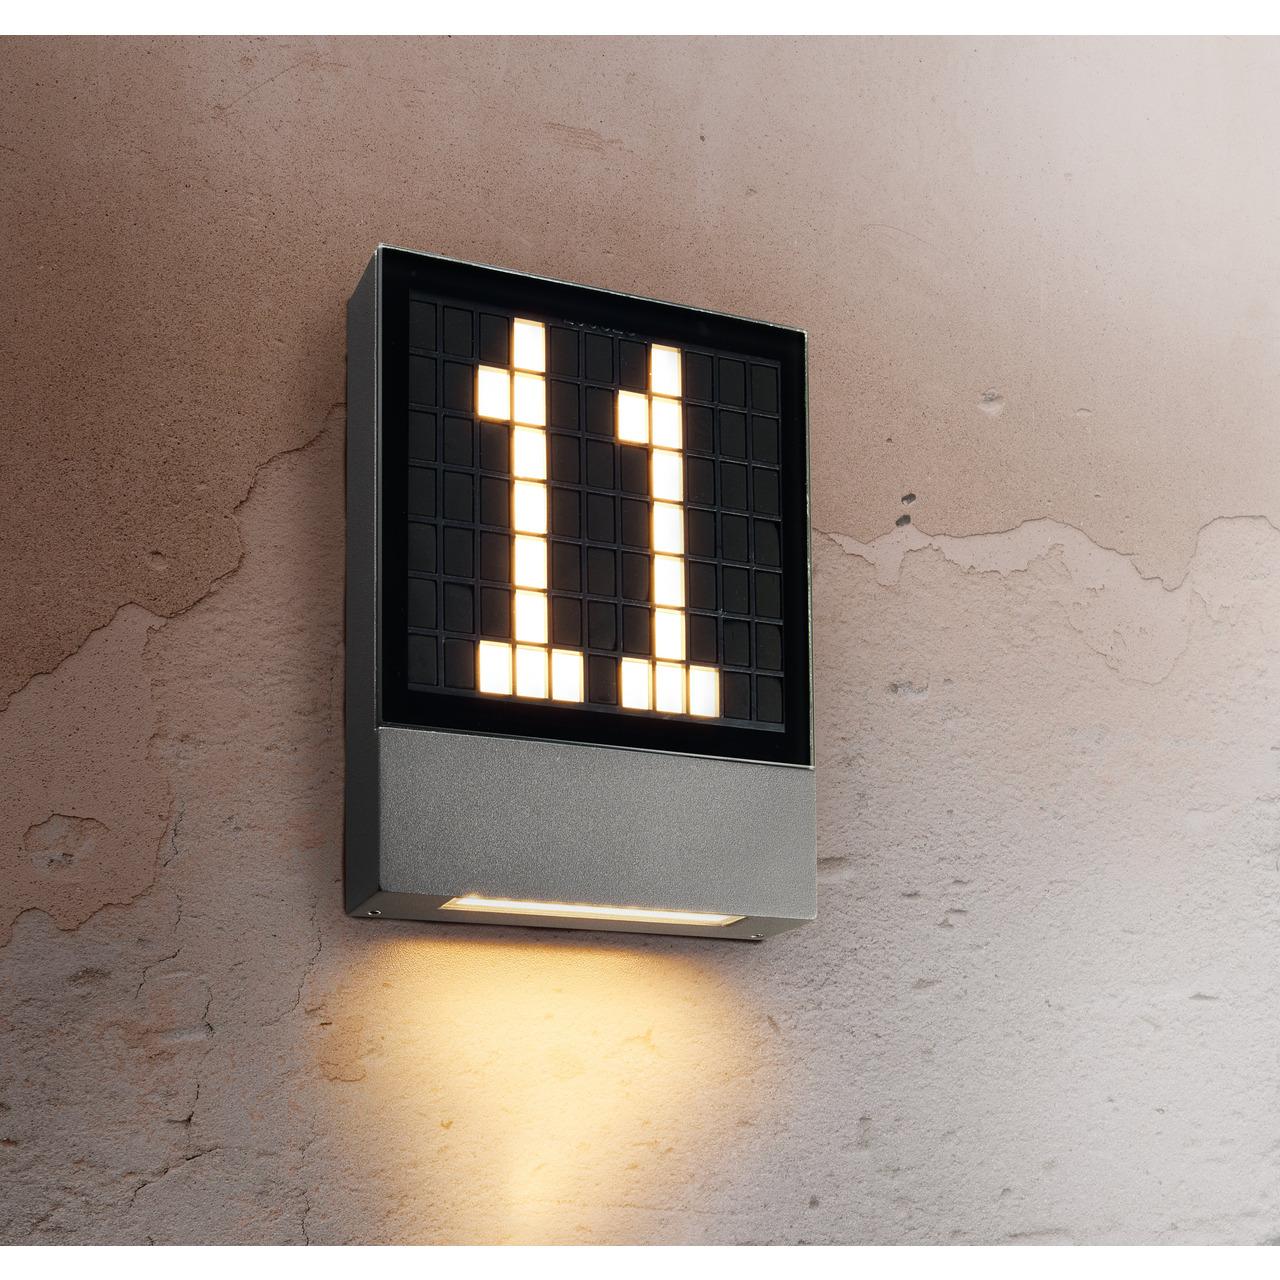 HEITRONIC 4-5-W-LED-Hausnummernleuchte Pavia- Ziffern steckbar- Aluminium-Gehund-228 use- 230 V AC- IP54